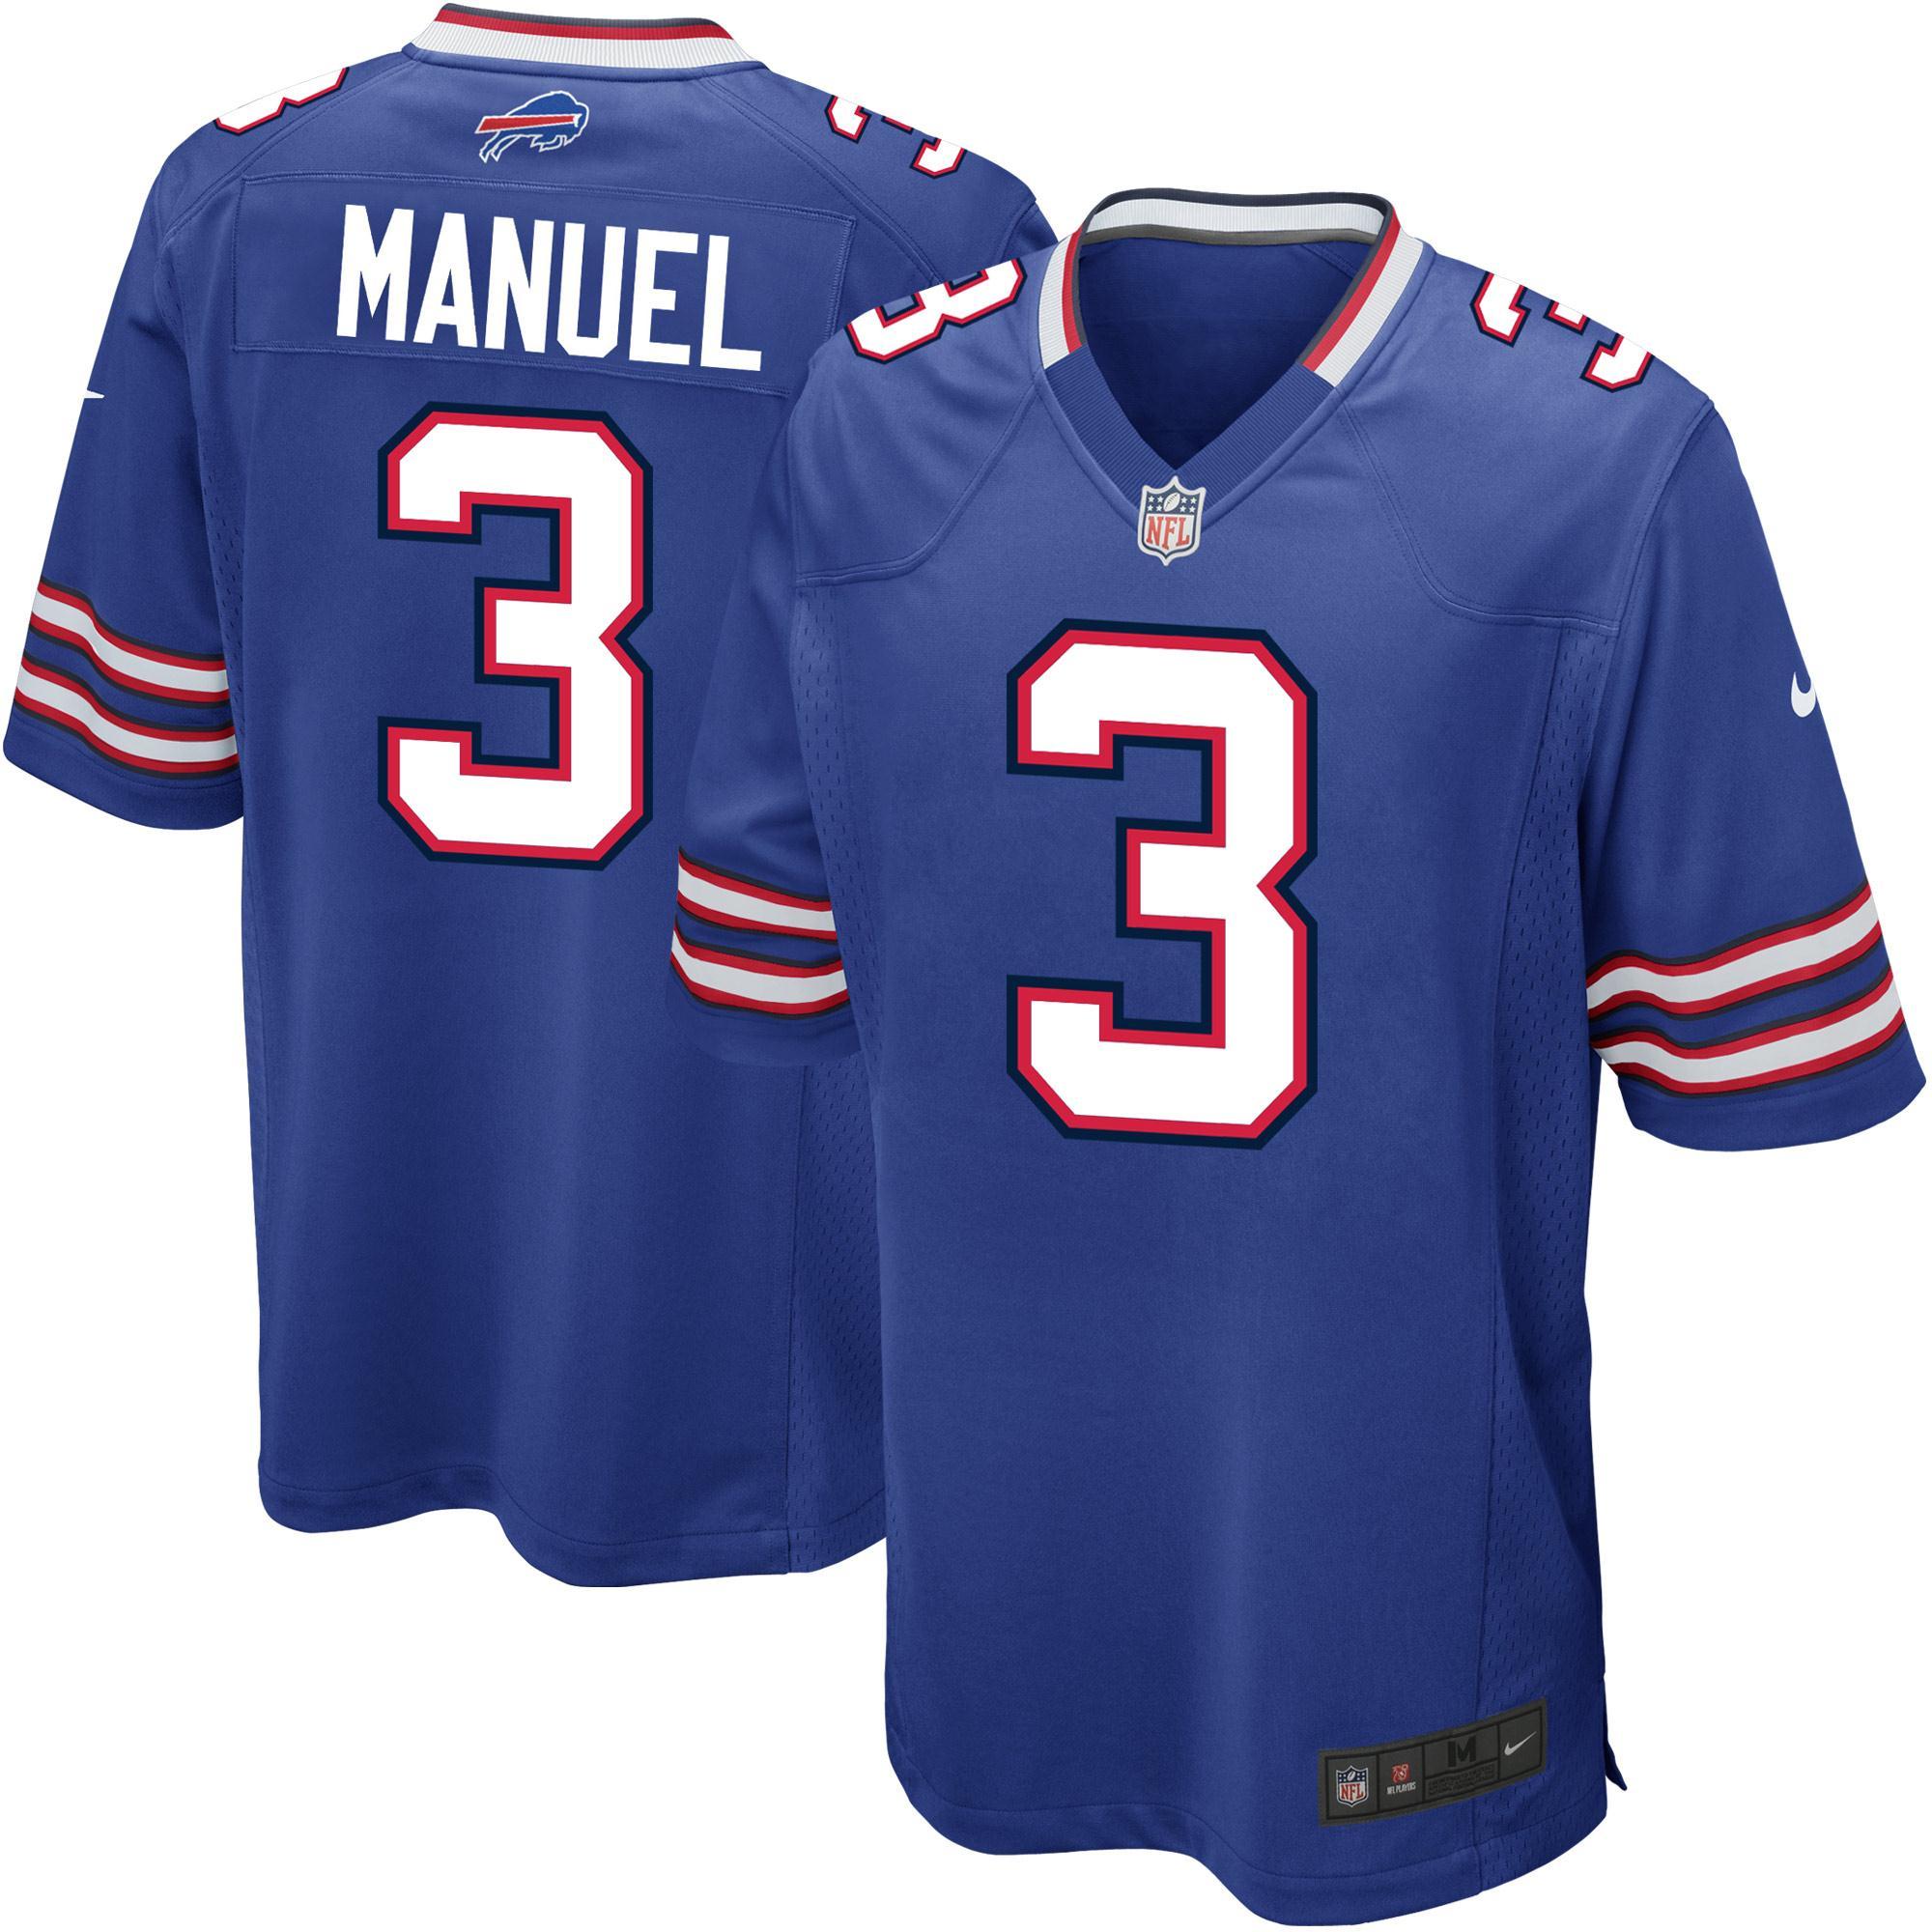 EJ Manuel Buffalo Bills Nike Youth Team Color Game Jersey - Royal Blue